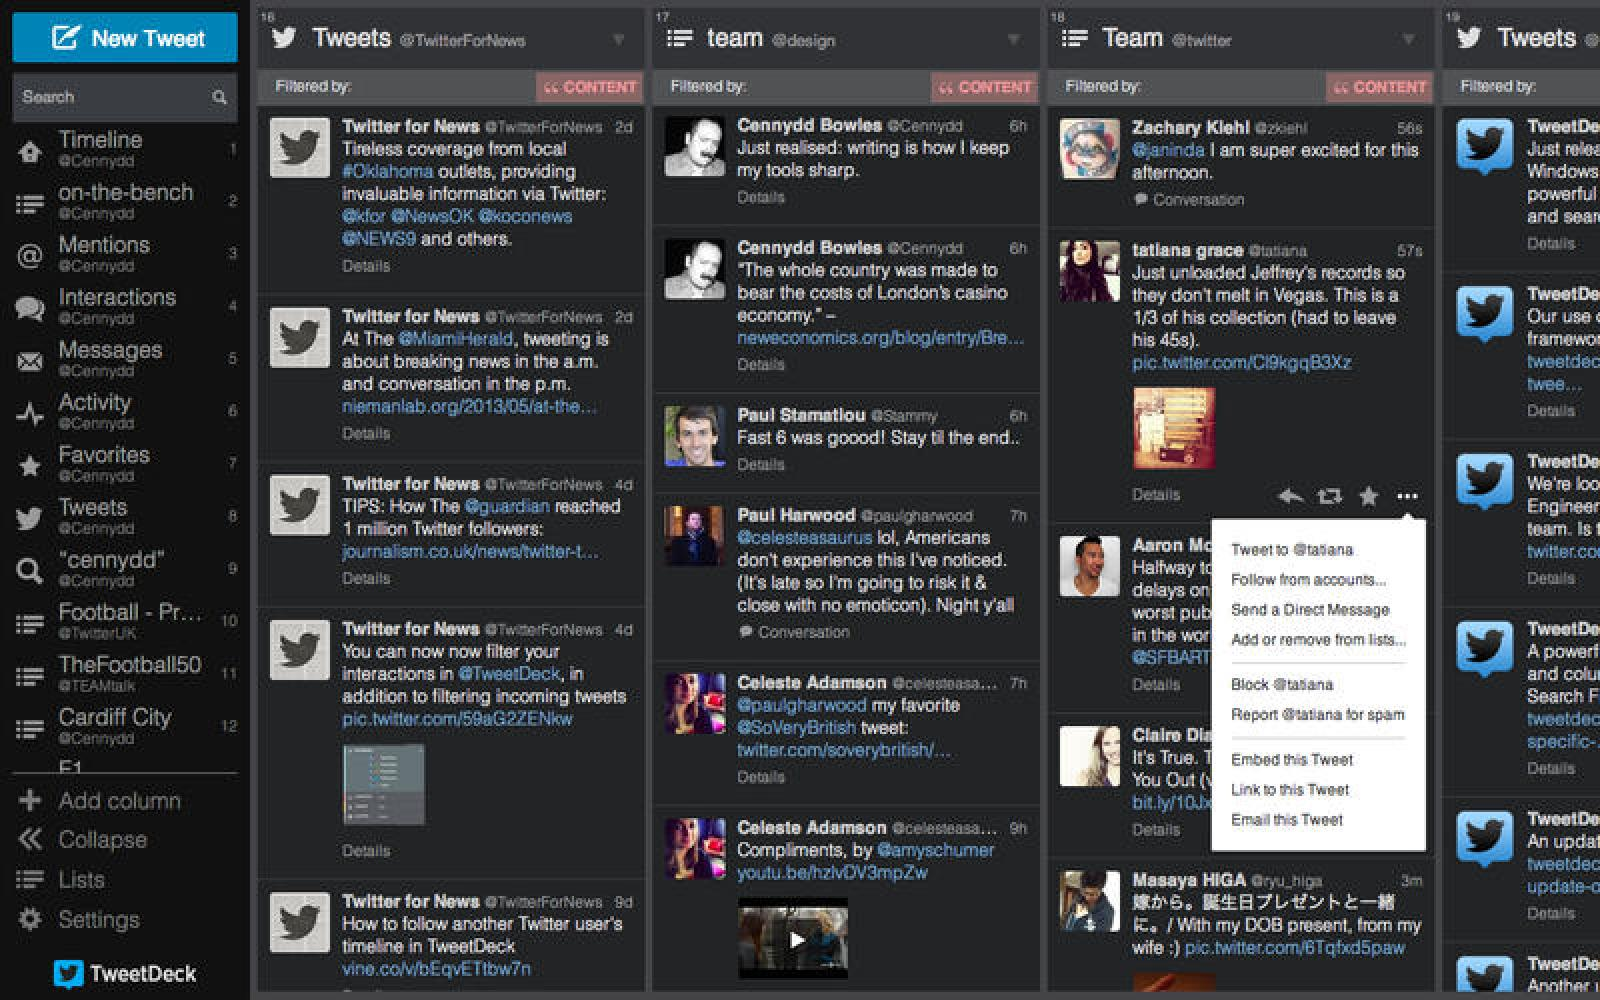 TweetDeck for Mac gets Regional/City Trends column, other improvements